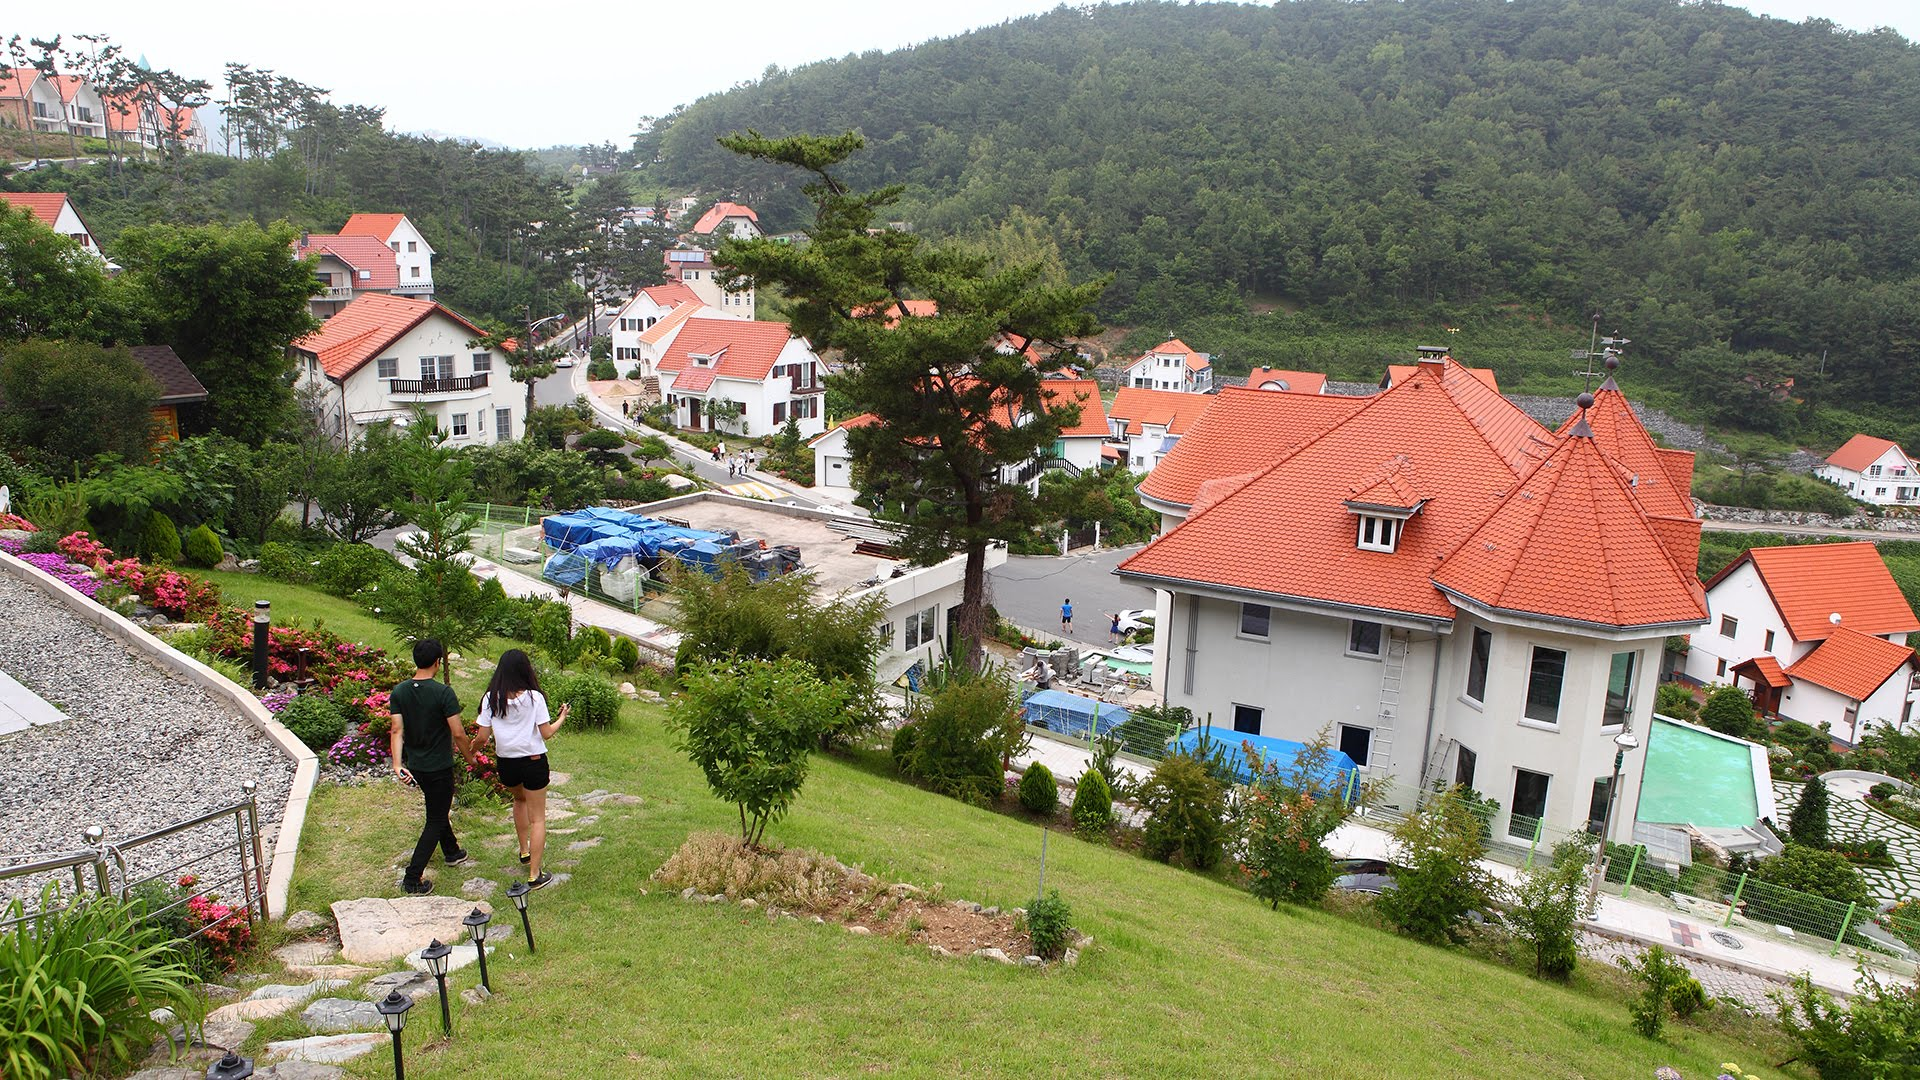 jerman village 1